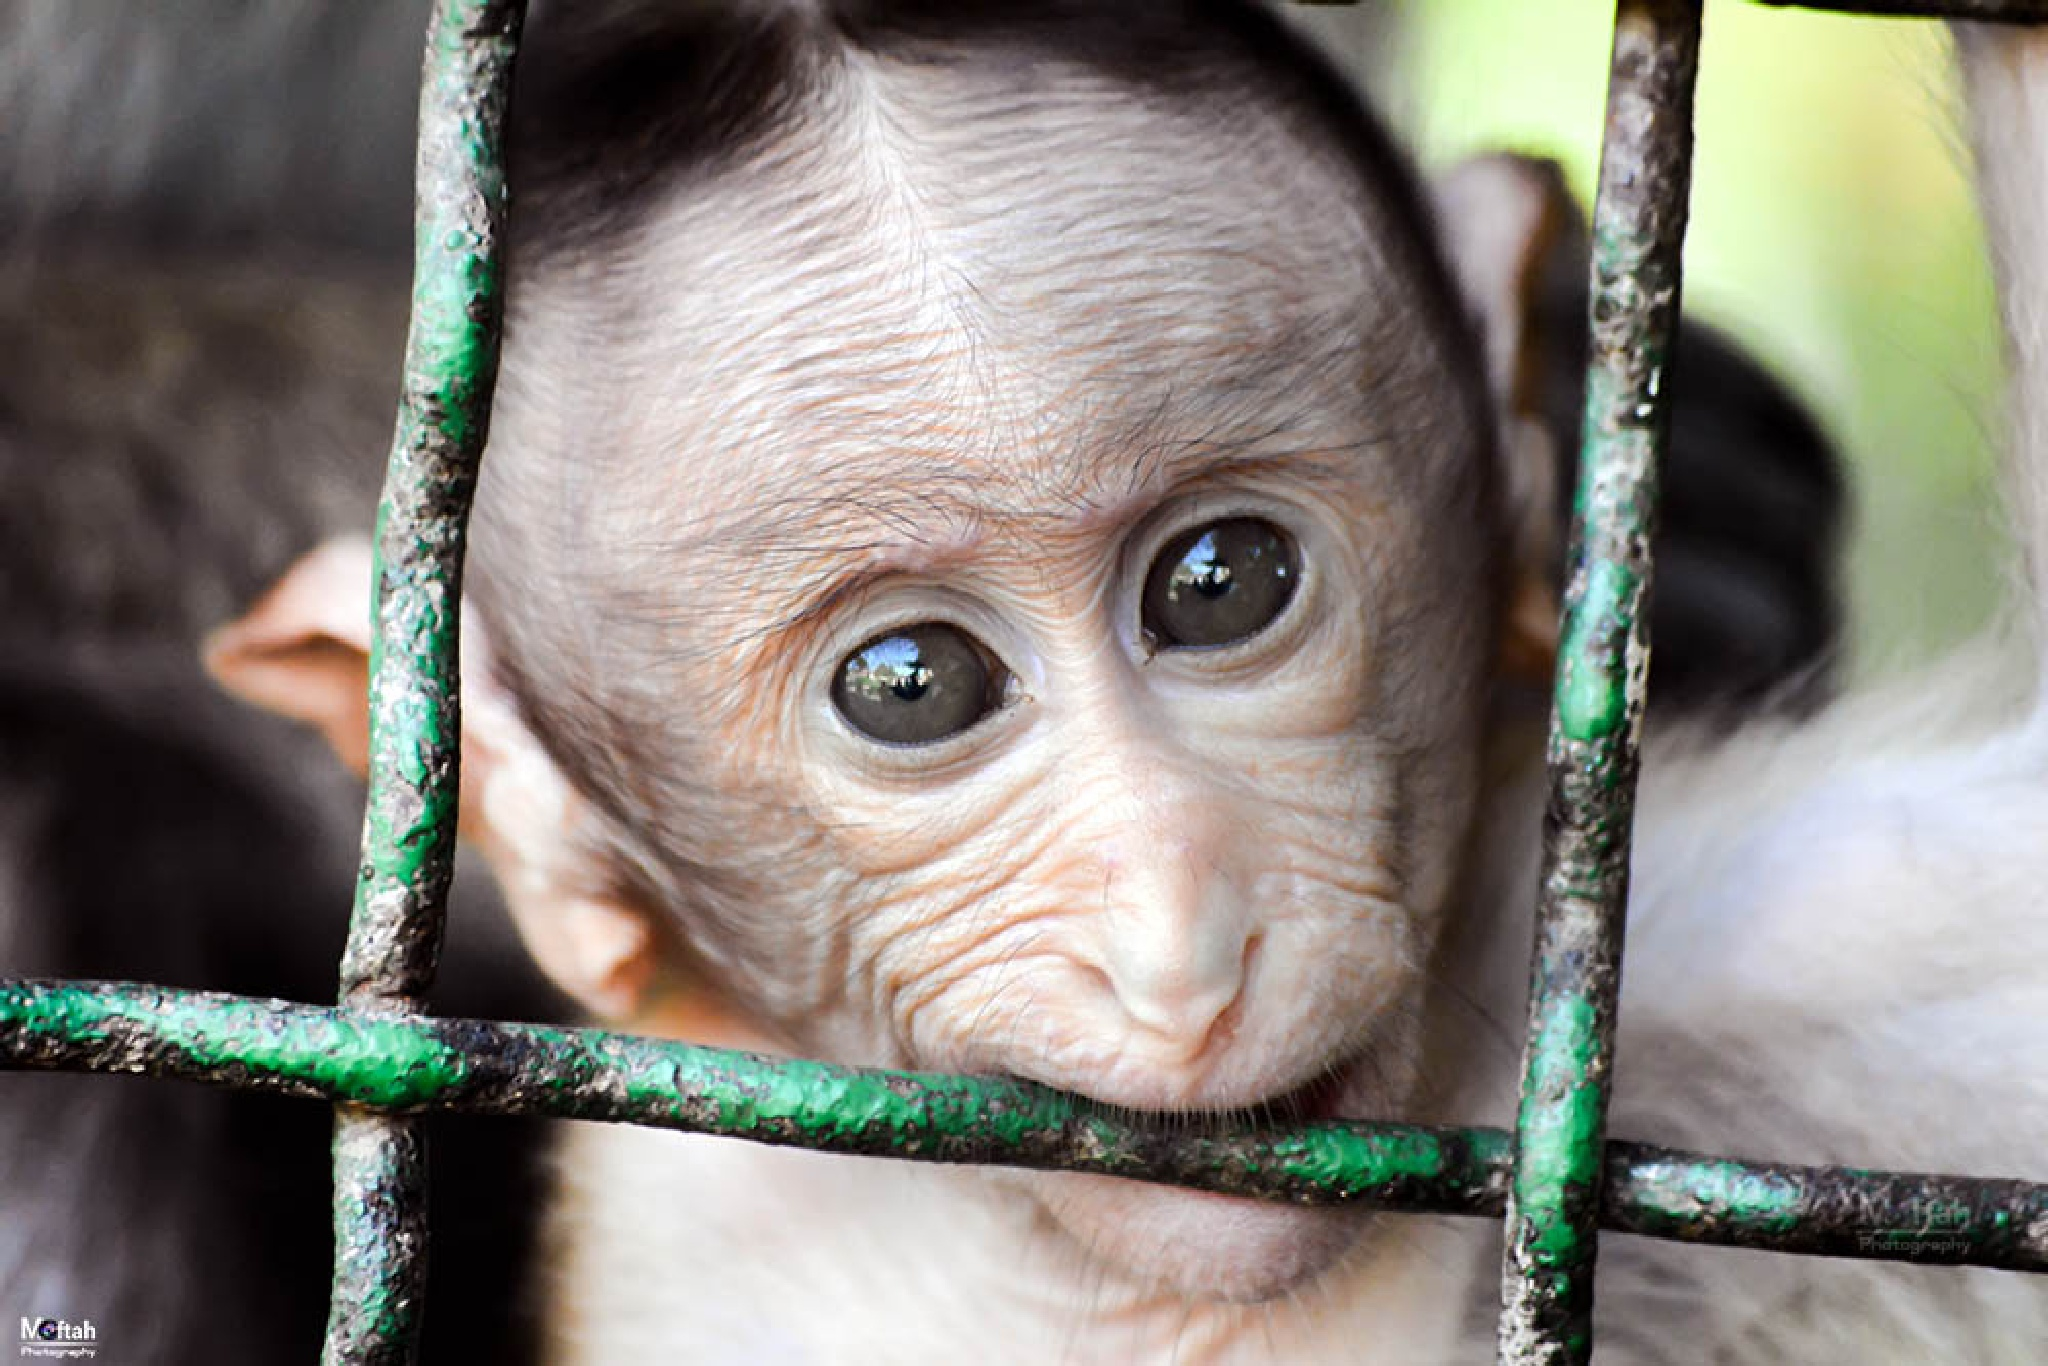 Monkey sad eyes by Abdallah Gamal